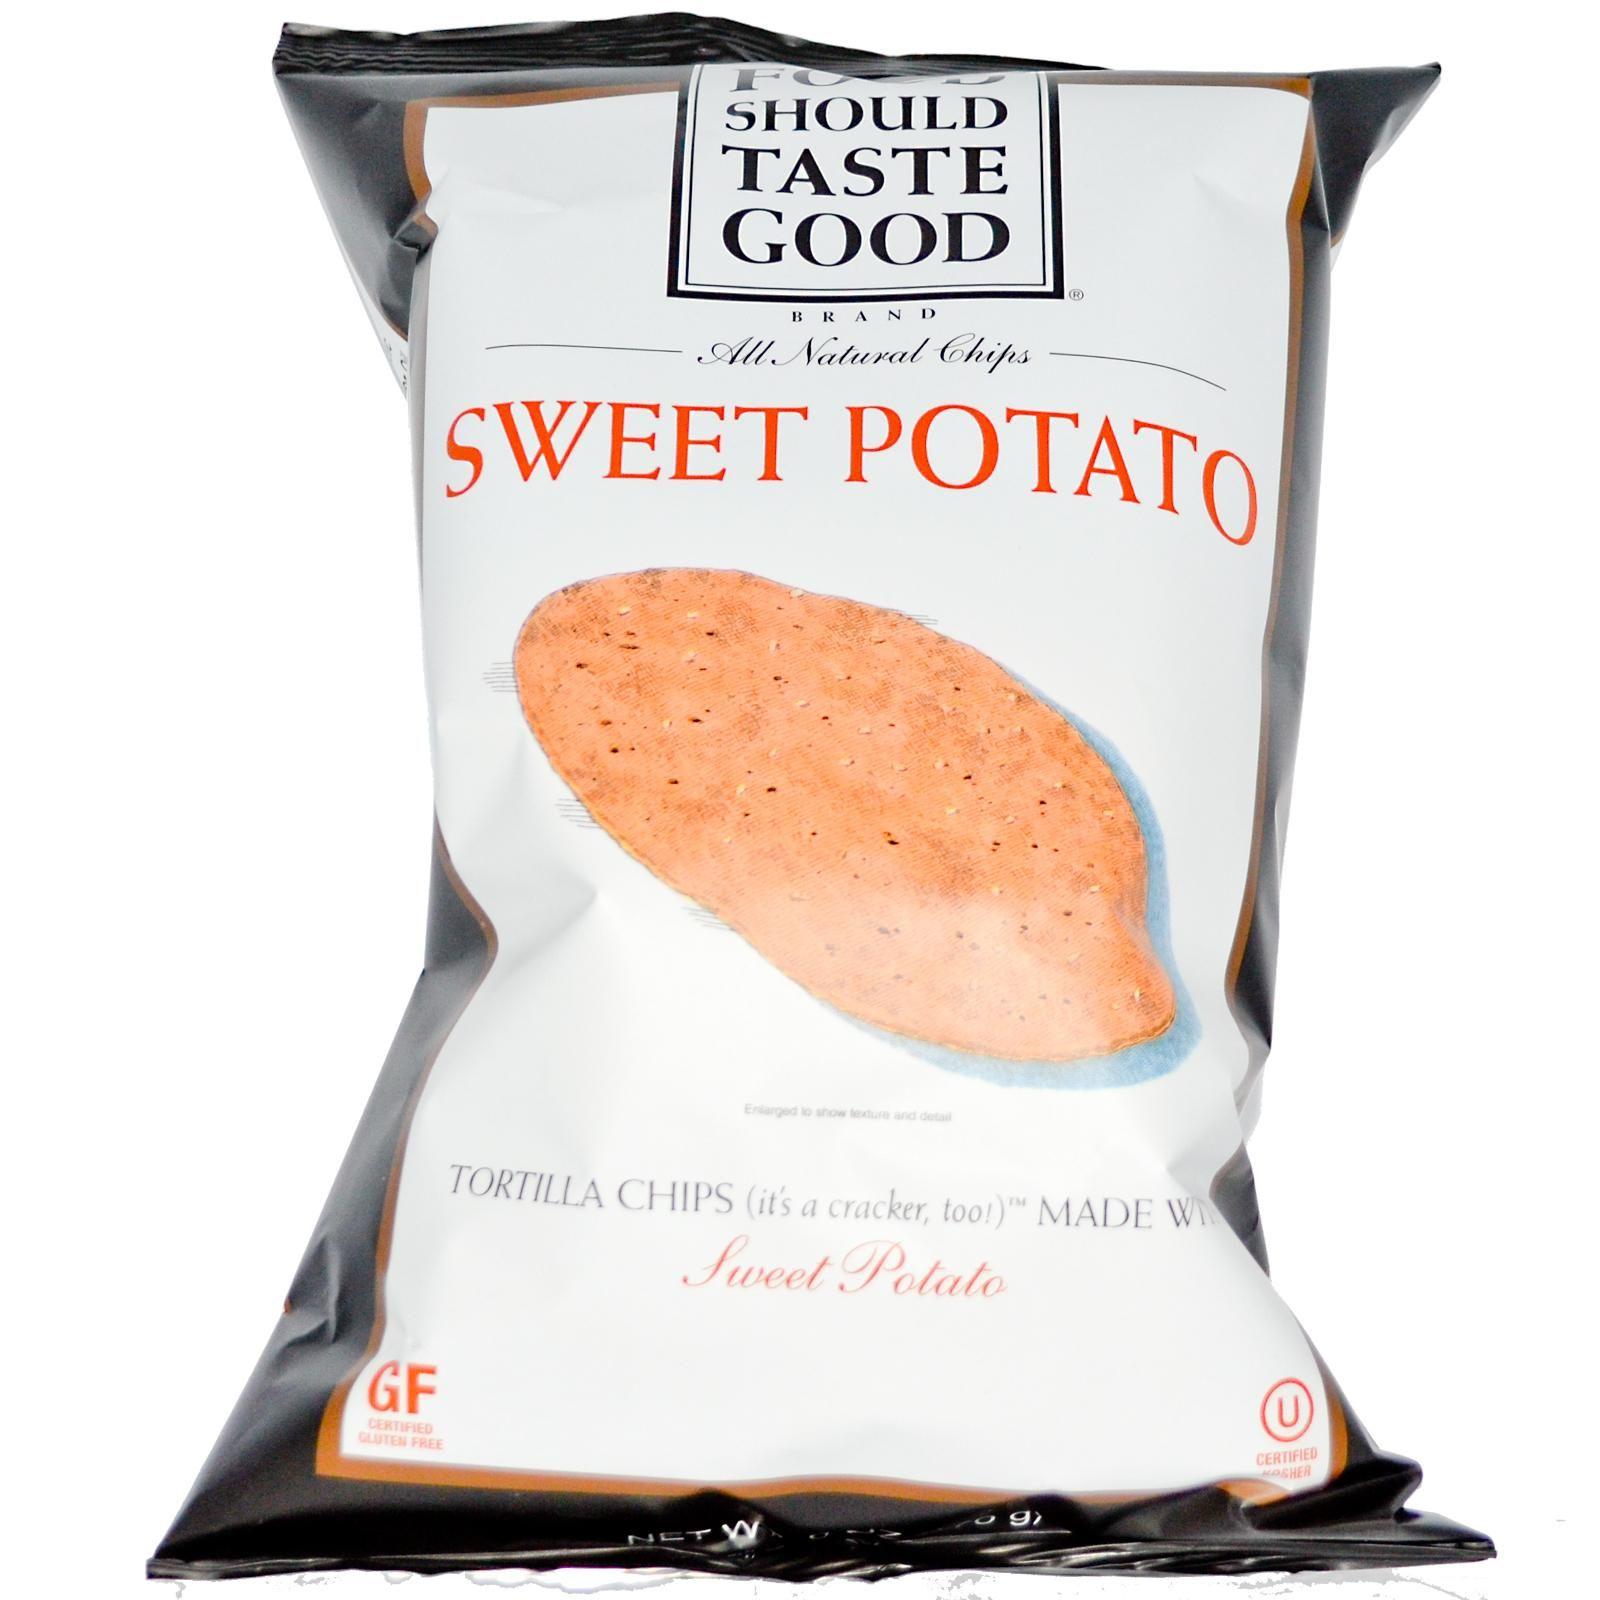 Food should taste good sweet potato tortilla chips food